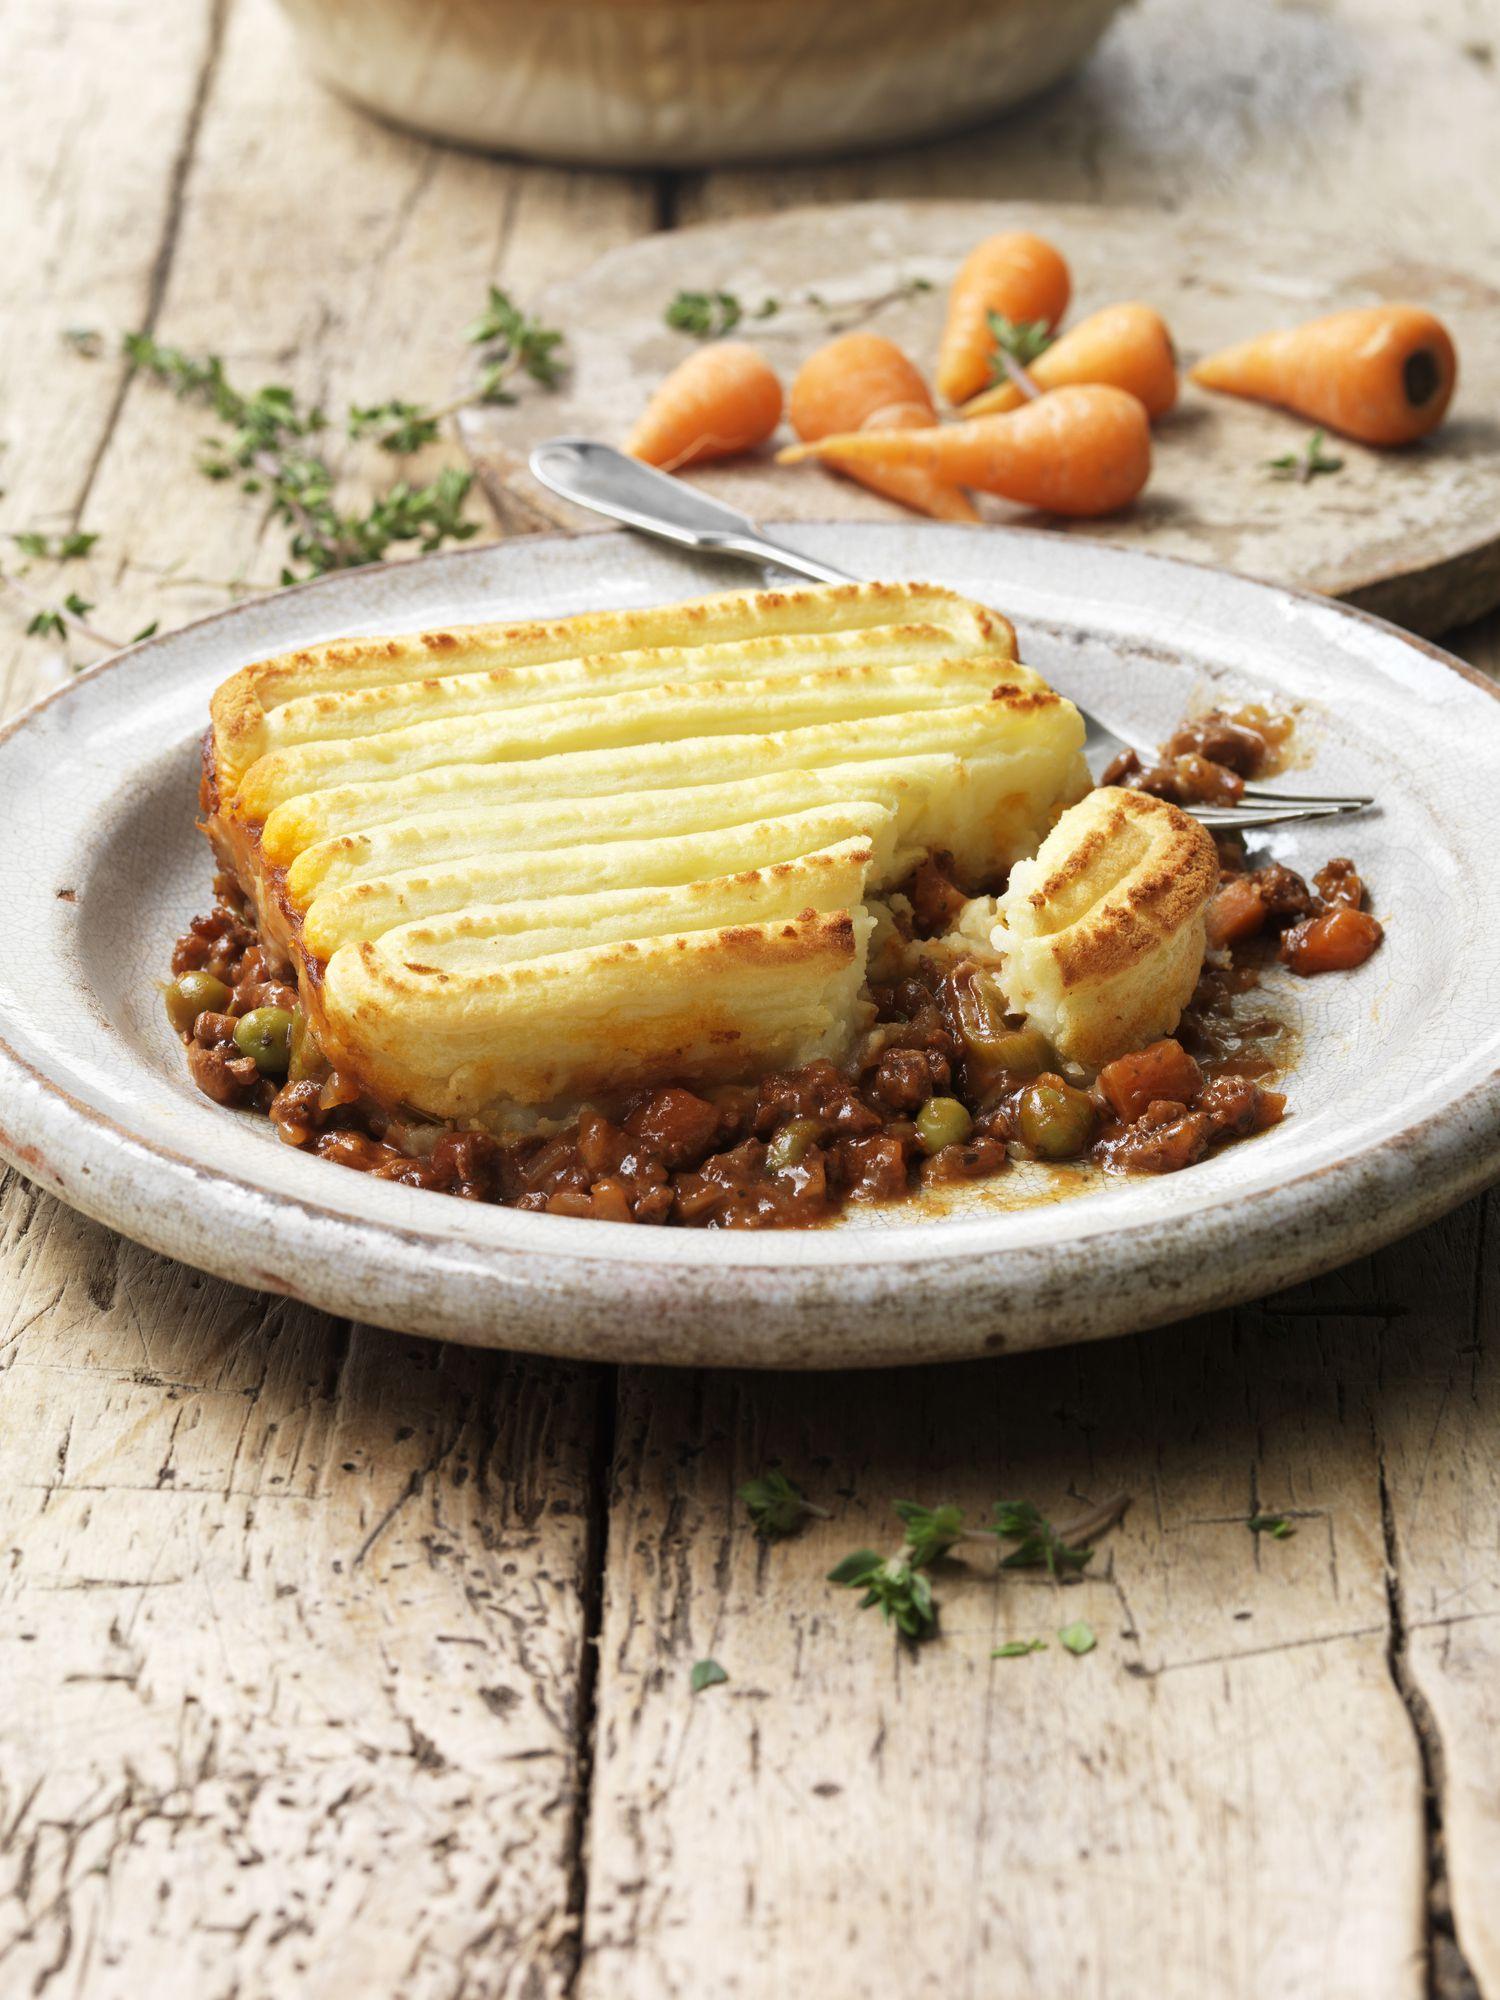 Vegan Shepherd S Pie Recipe With Green Peas And Tvp